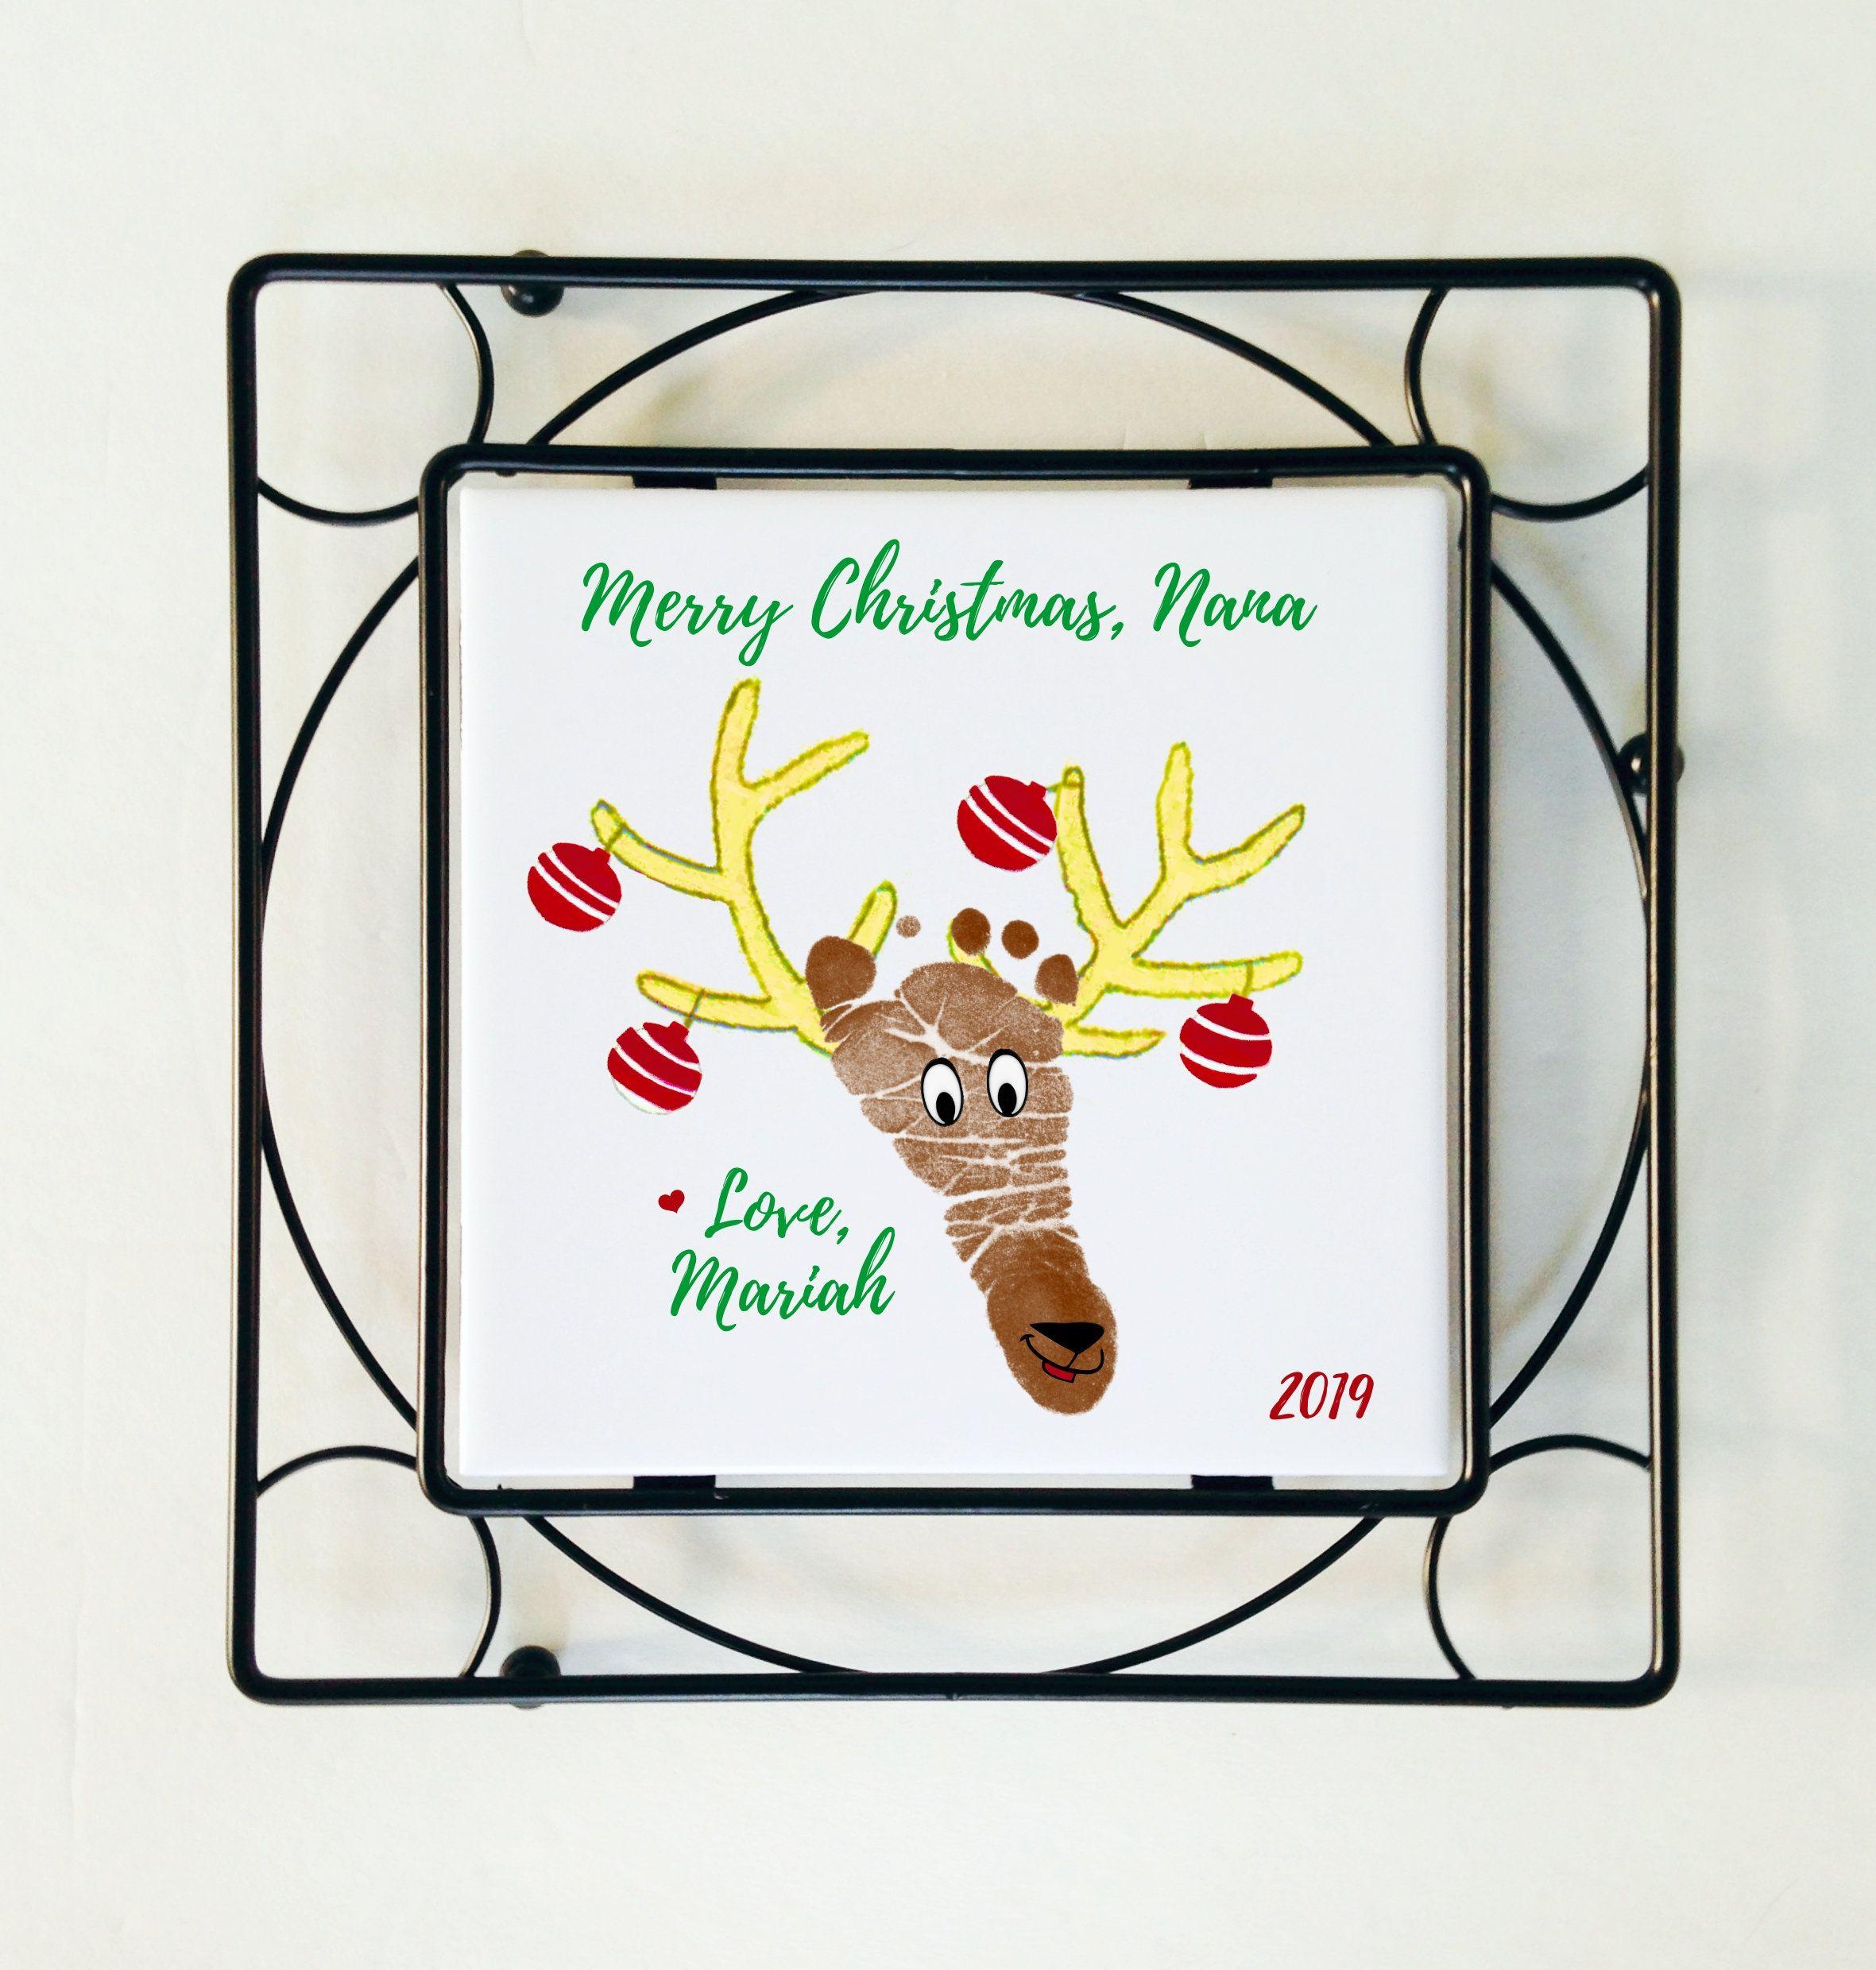 Holiday Footprint and Handprint Ceramic Tile w/Black Wrought Iron Frame; Reindeer, Christmas Tree, Mistletoe Footprints, Try R Print Kits! #mistletoesfootprintcraft